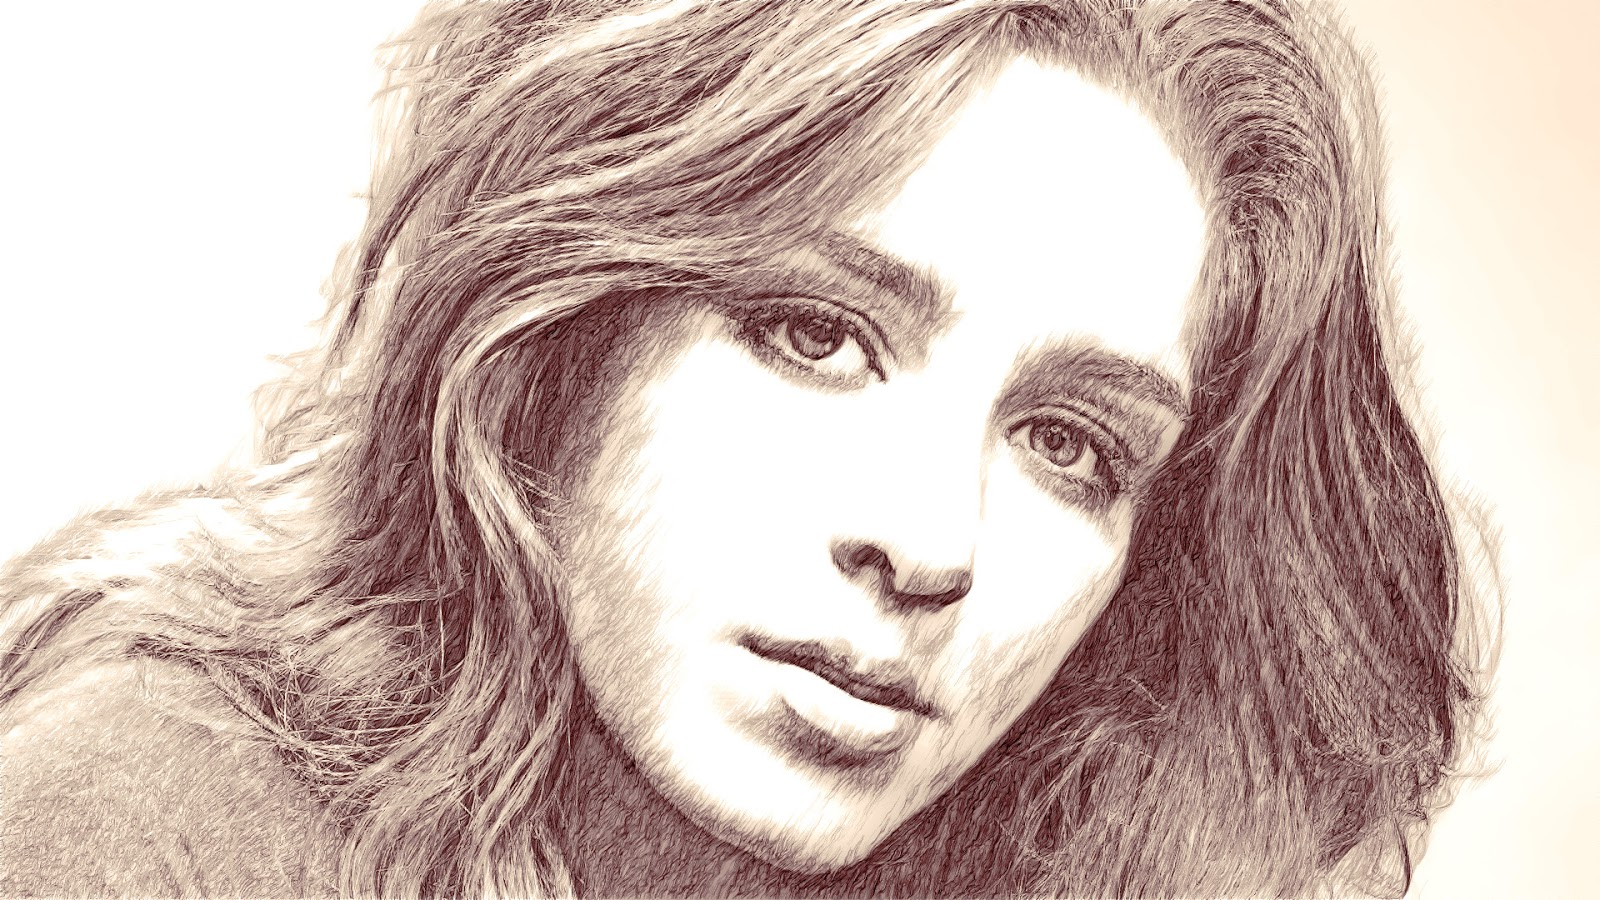 Pencil portrait tutorial